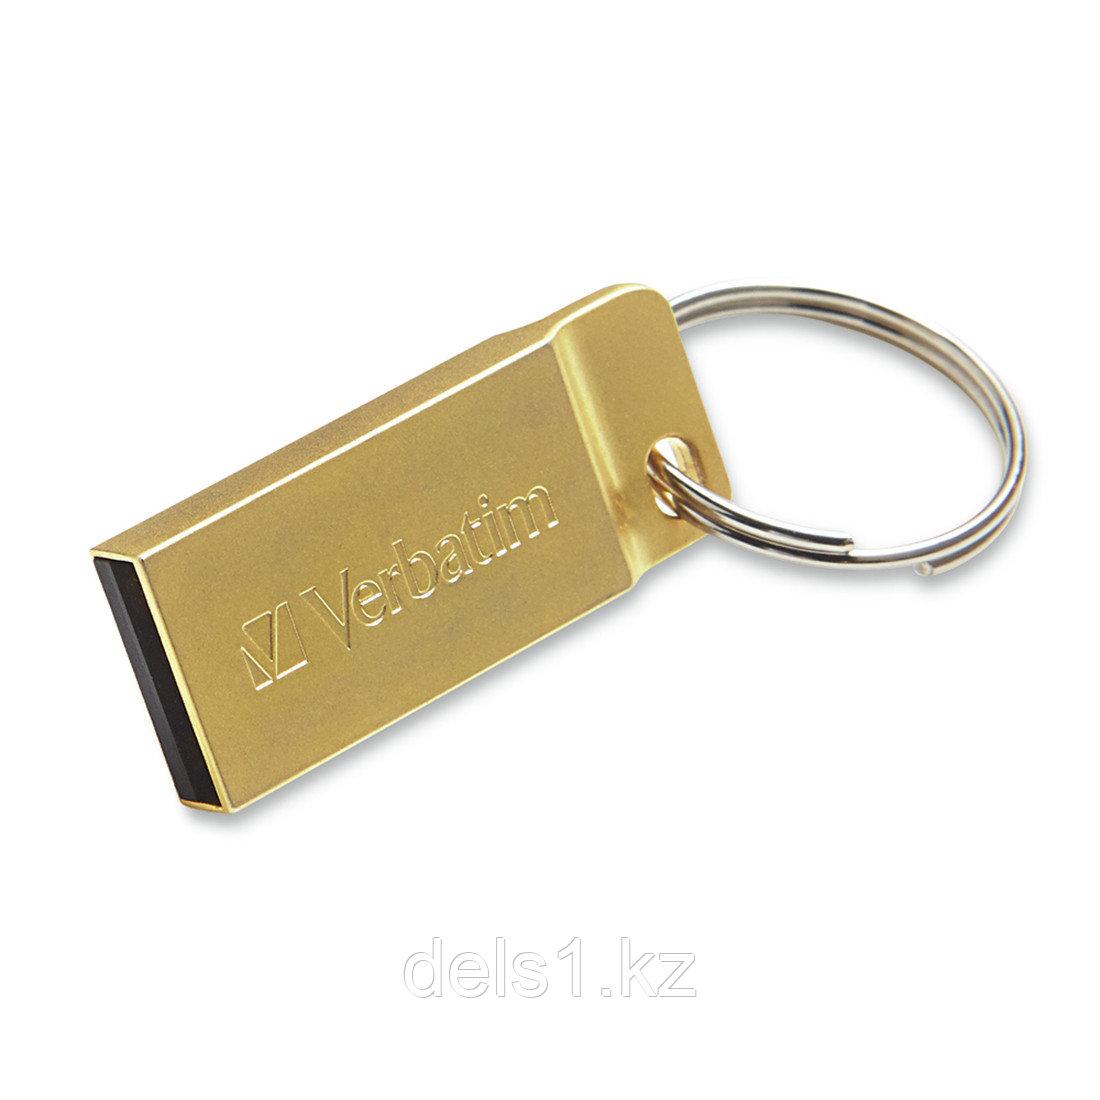 USB-накопитель Verbatim 99105 32GB USB 3.2 Золотистый